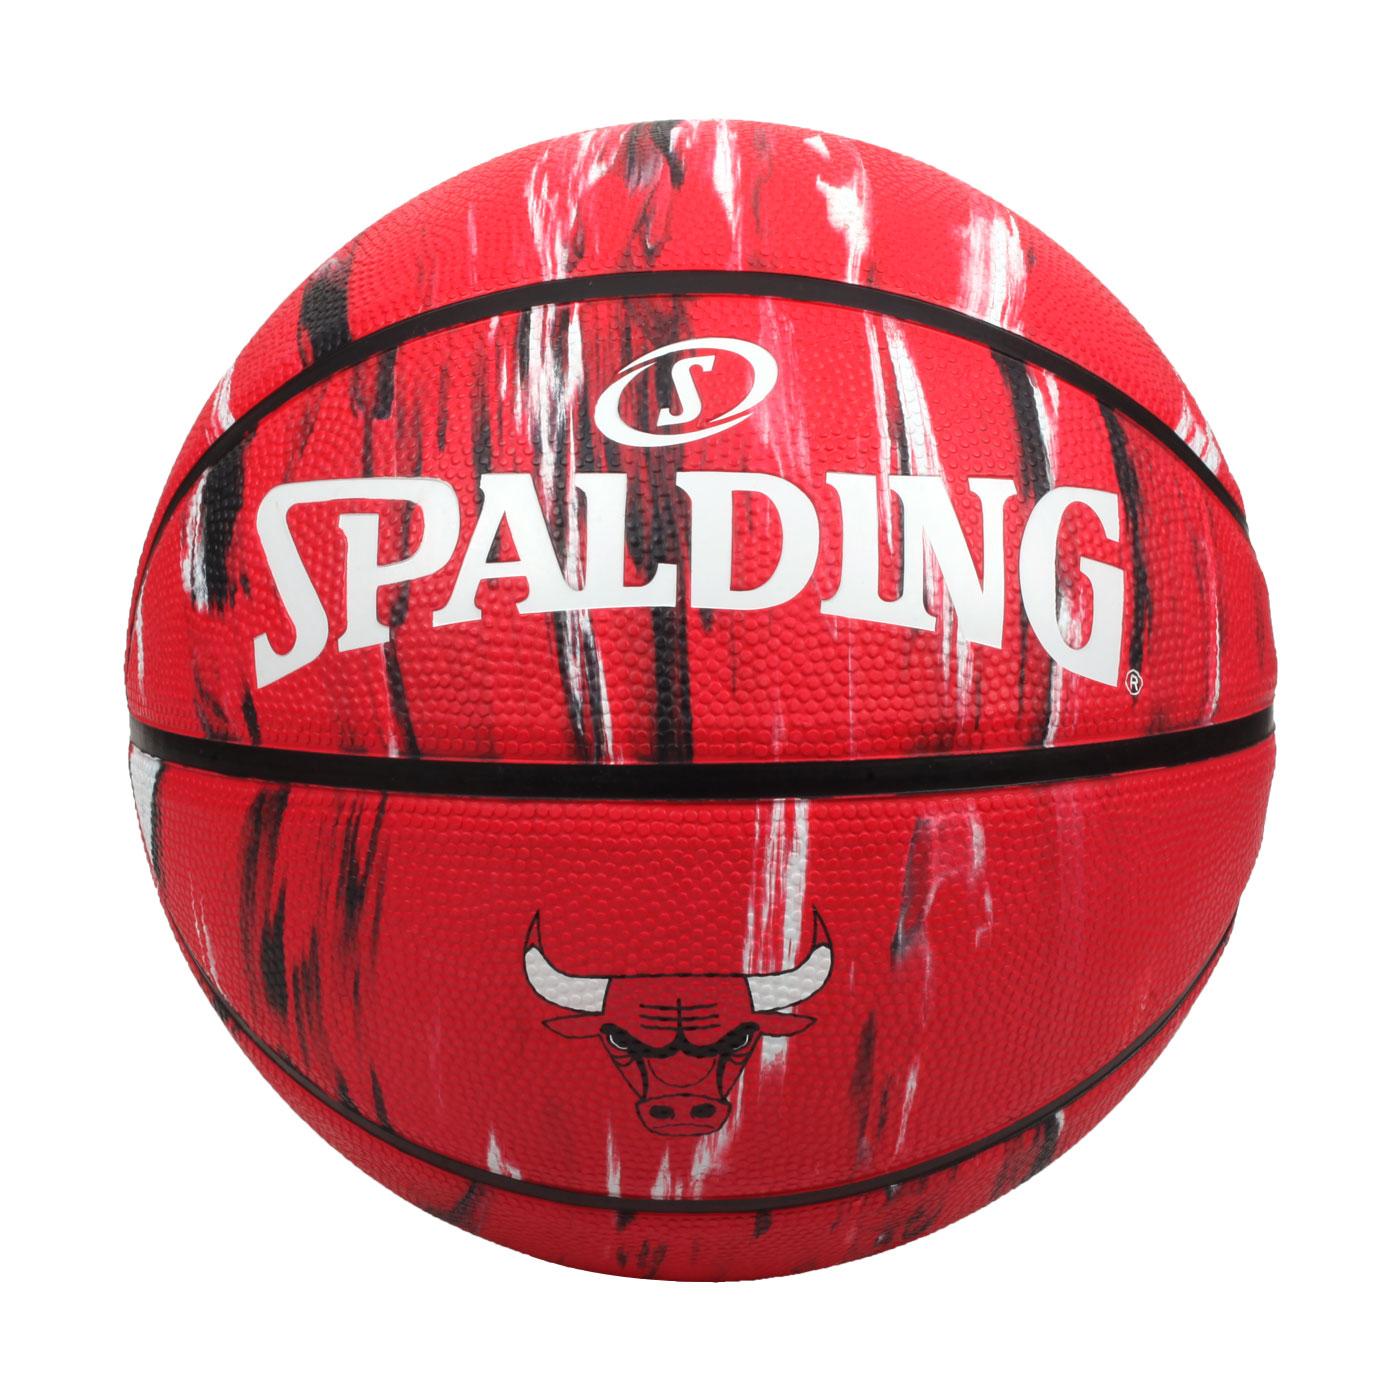 SPALDING NBA隊徽-公牛 #7籃球 SPA39670 SPA84127 - 紅白黑